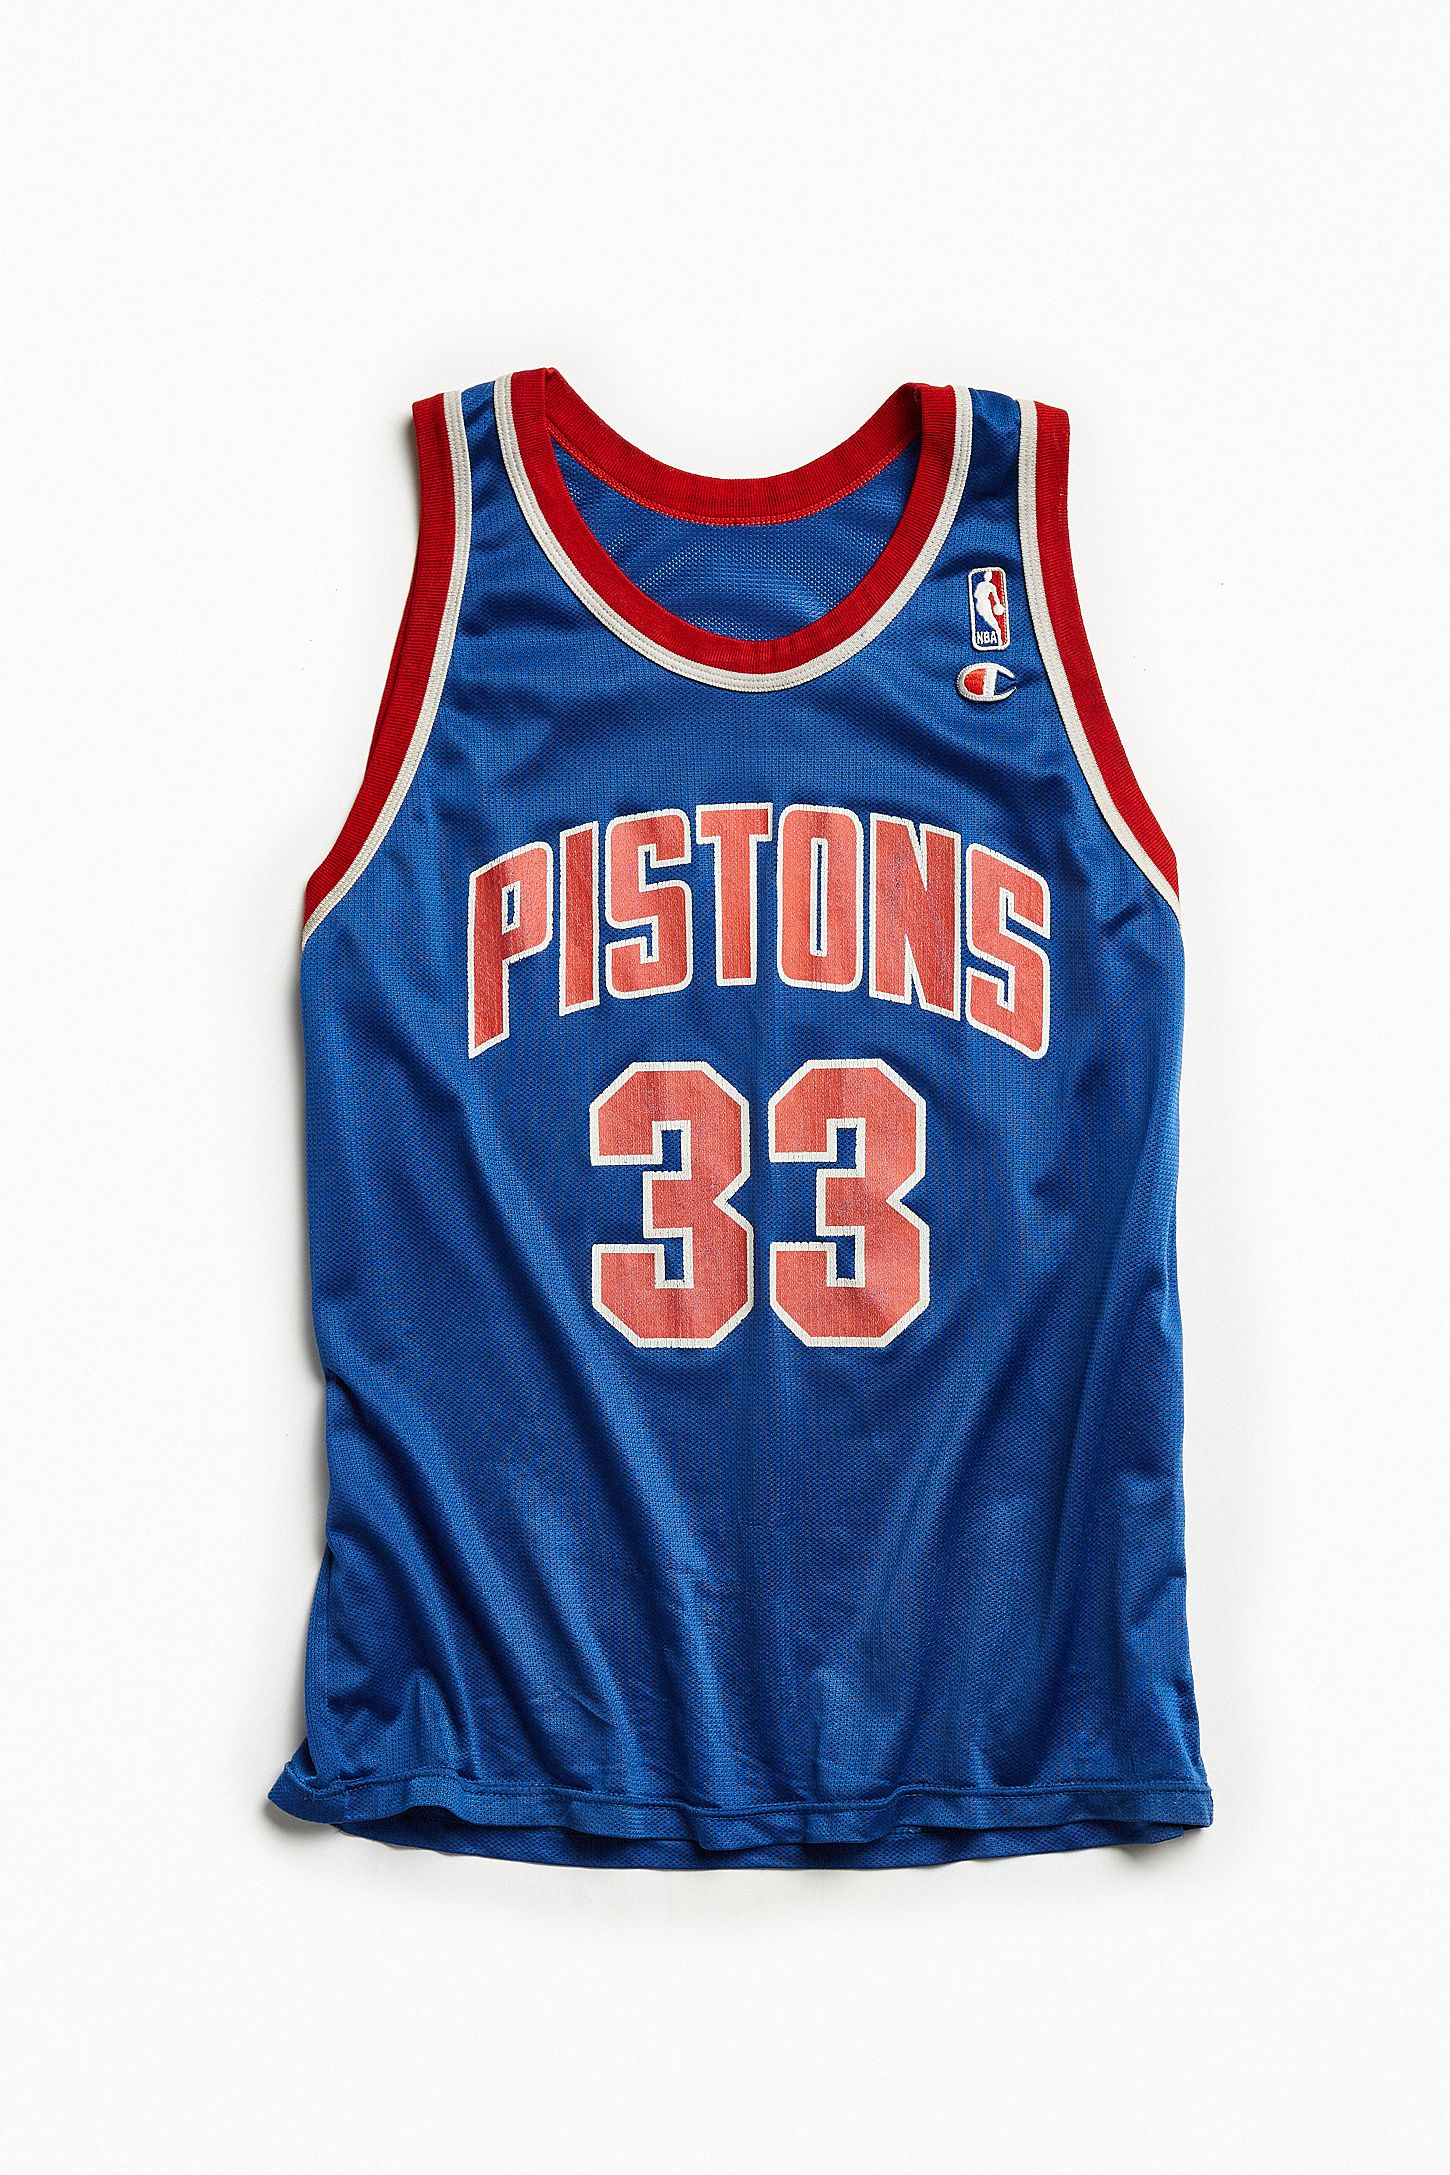 c58b10a40 Vintage Detroit Pistons Grant Hill Blue Basketball Jersey